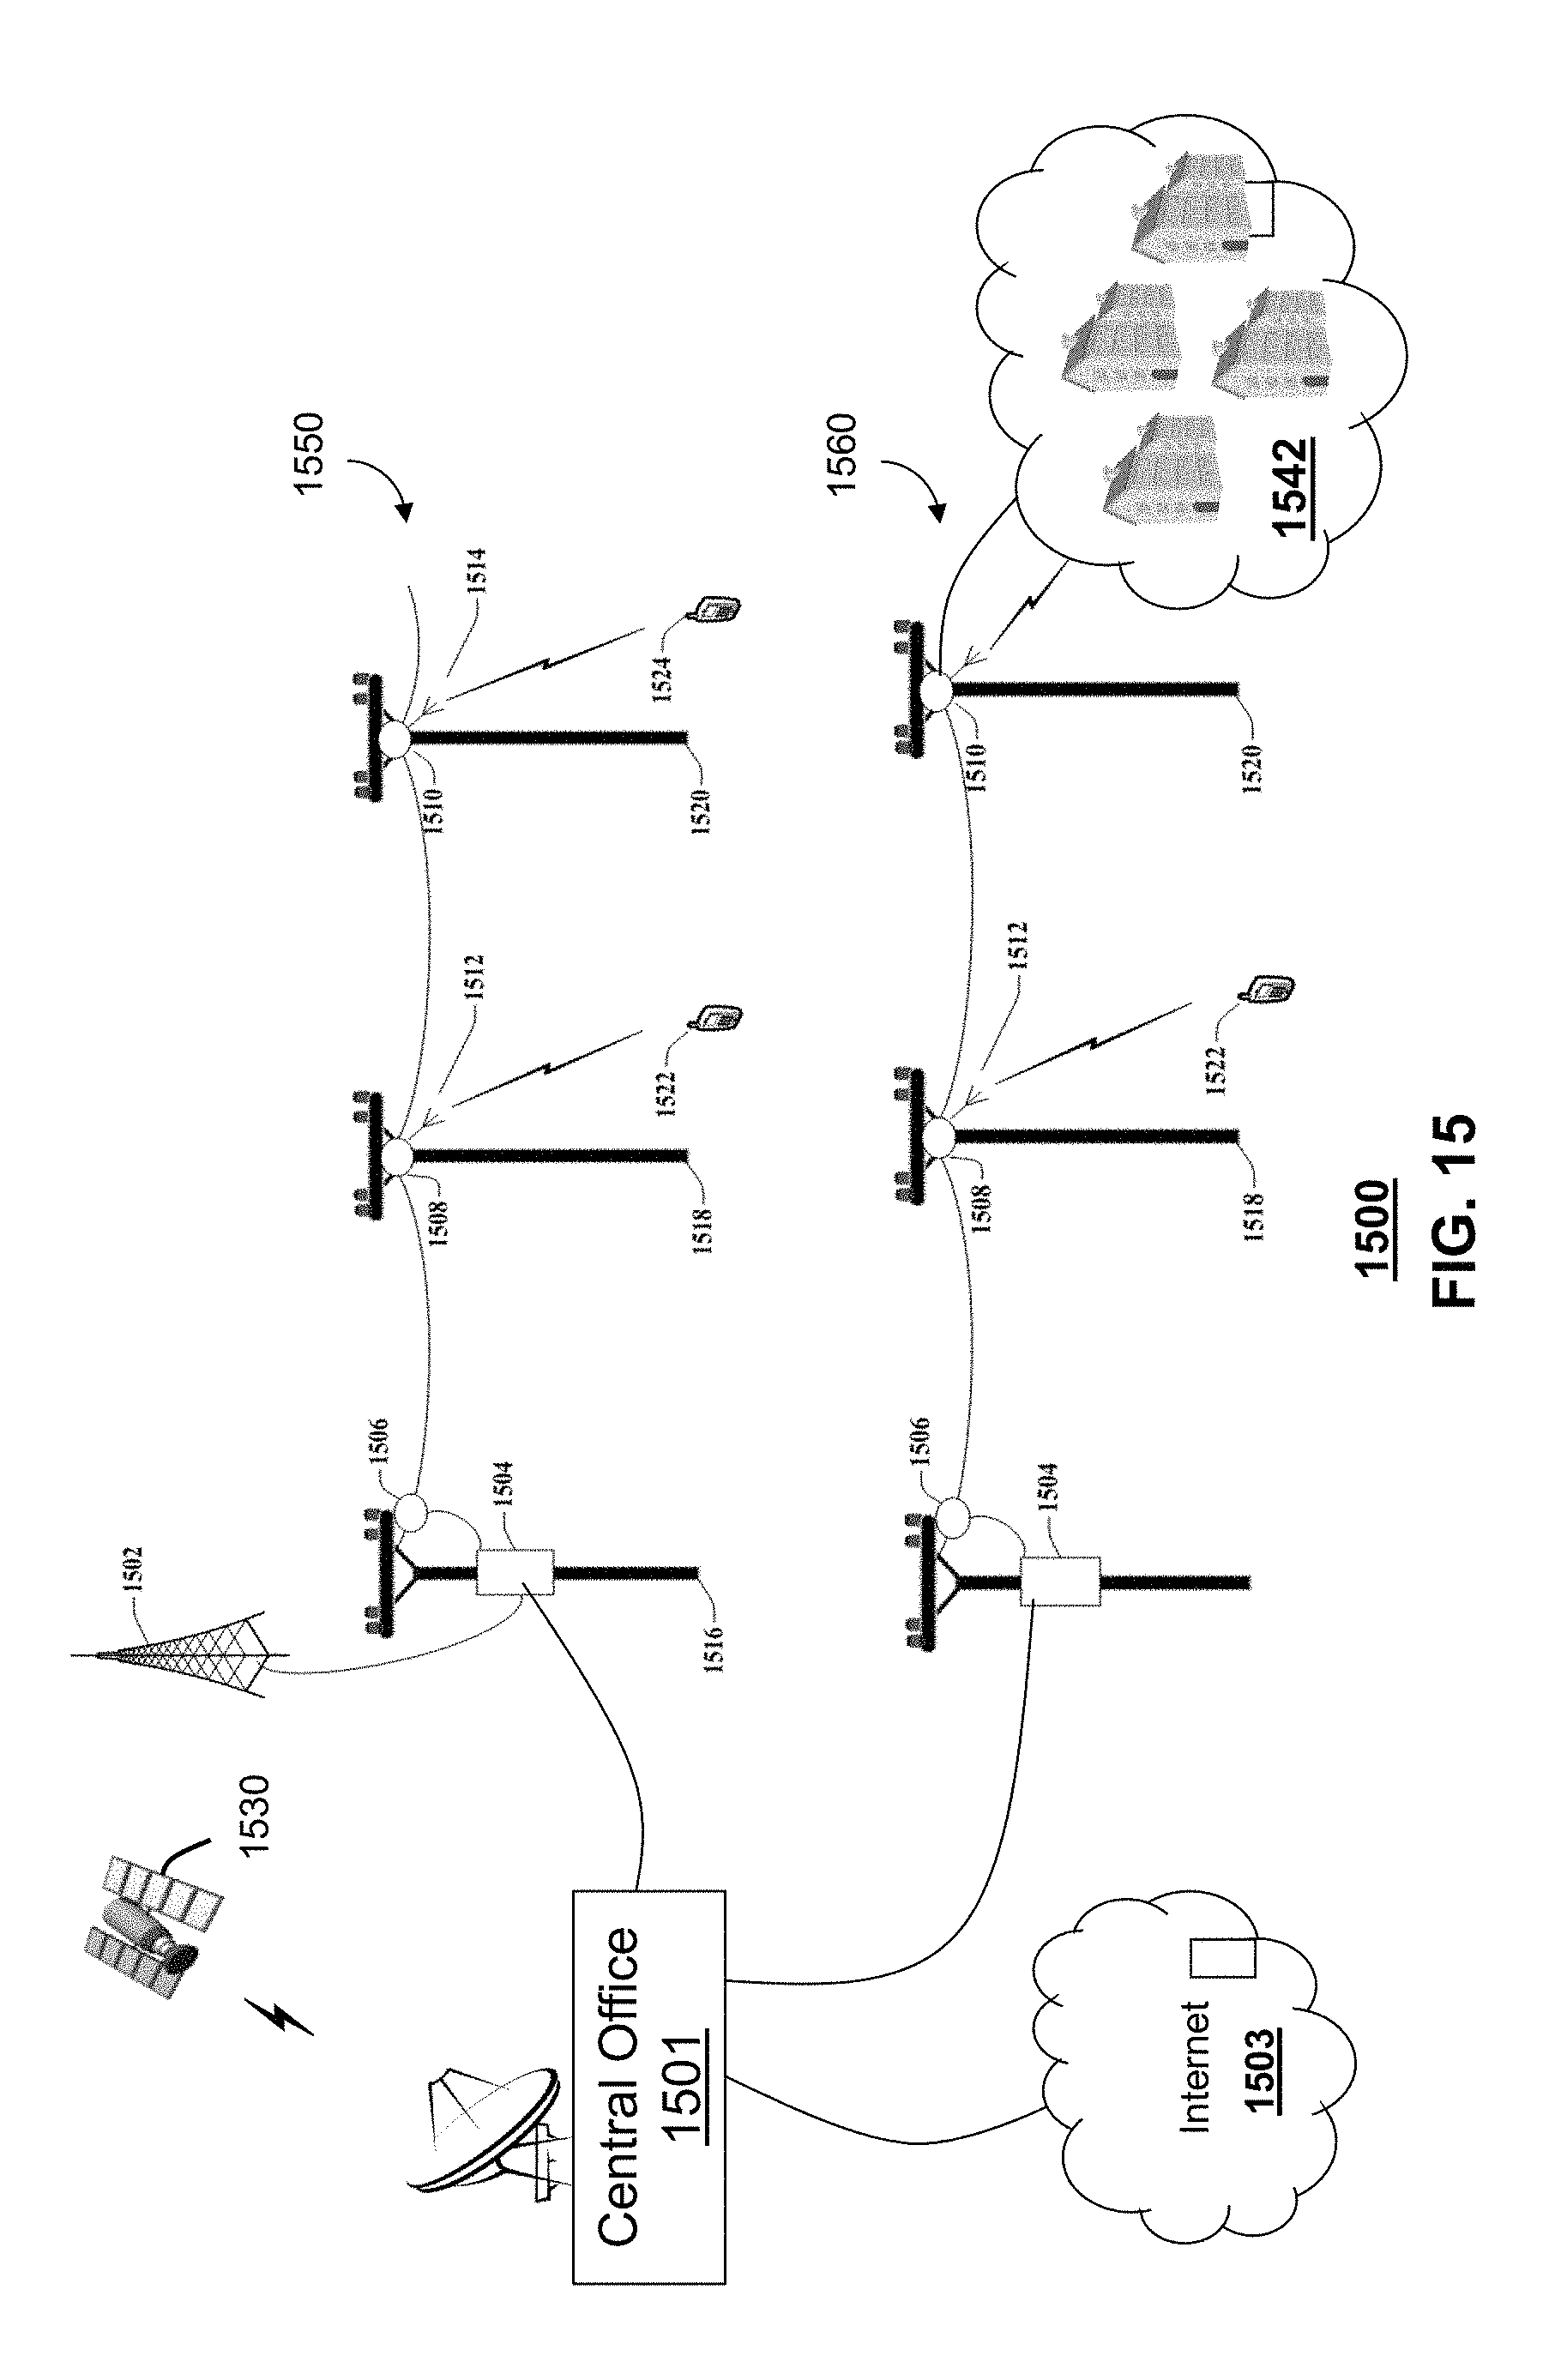 Fuse Box Diagram For Ford Freestar Basic Wiring F